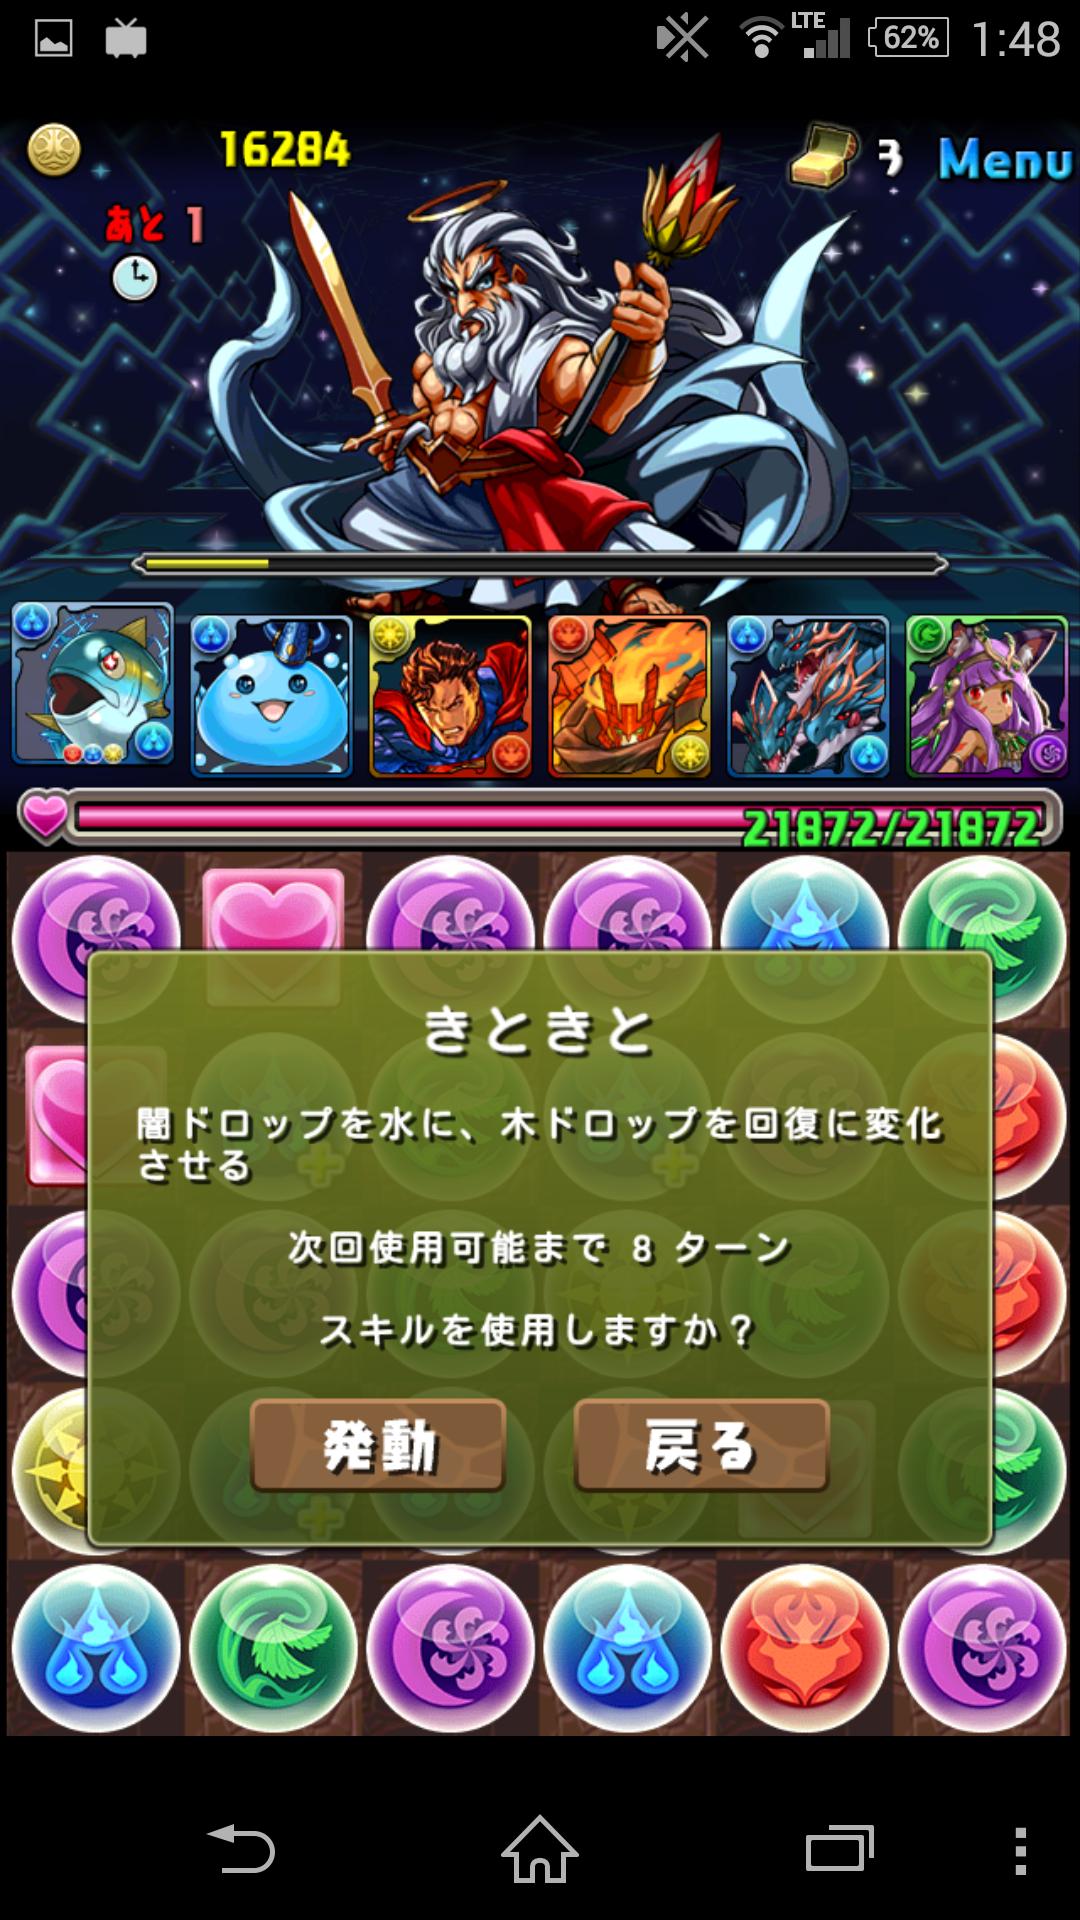 Screenshot_2014-11-13-01-48-08.png